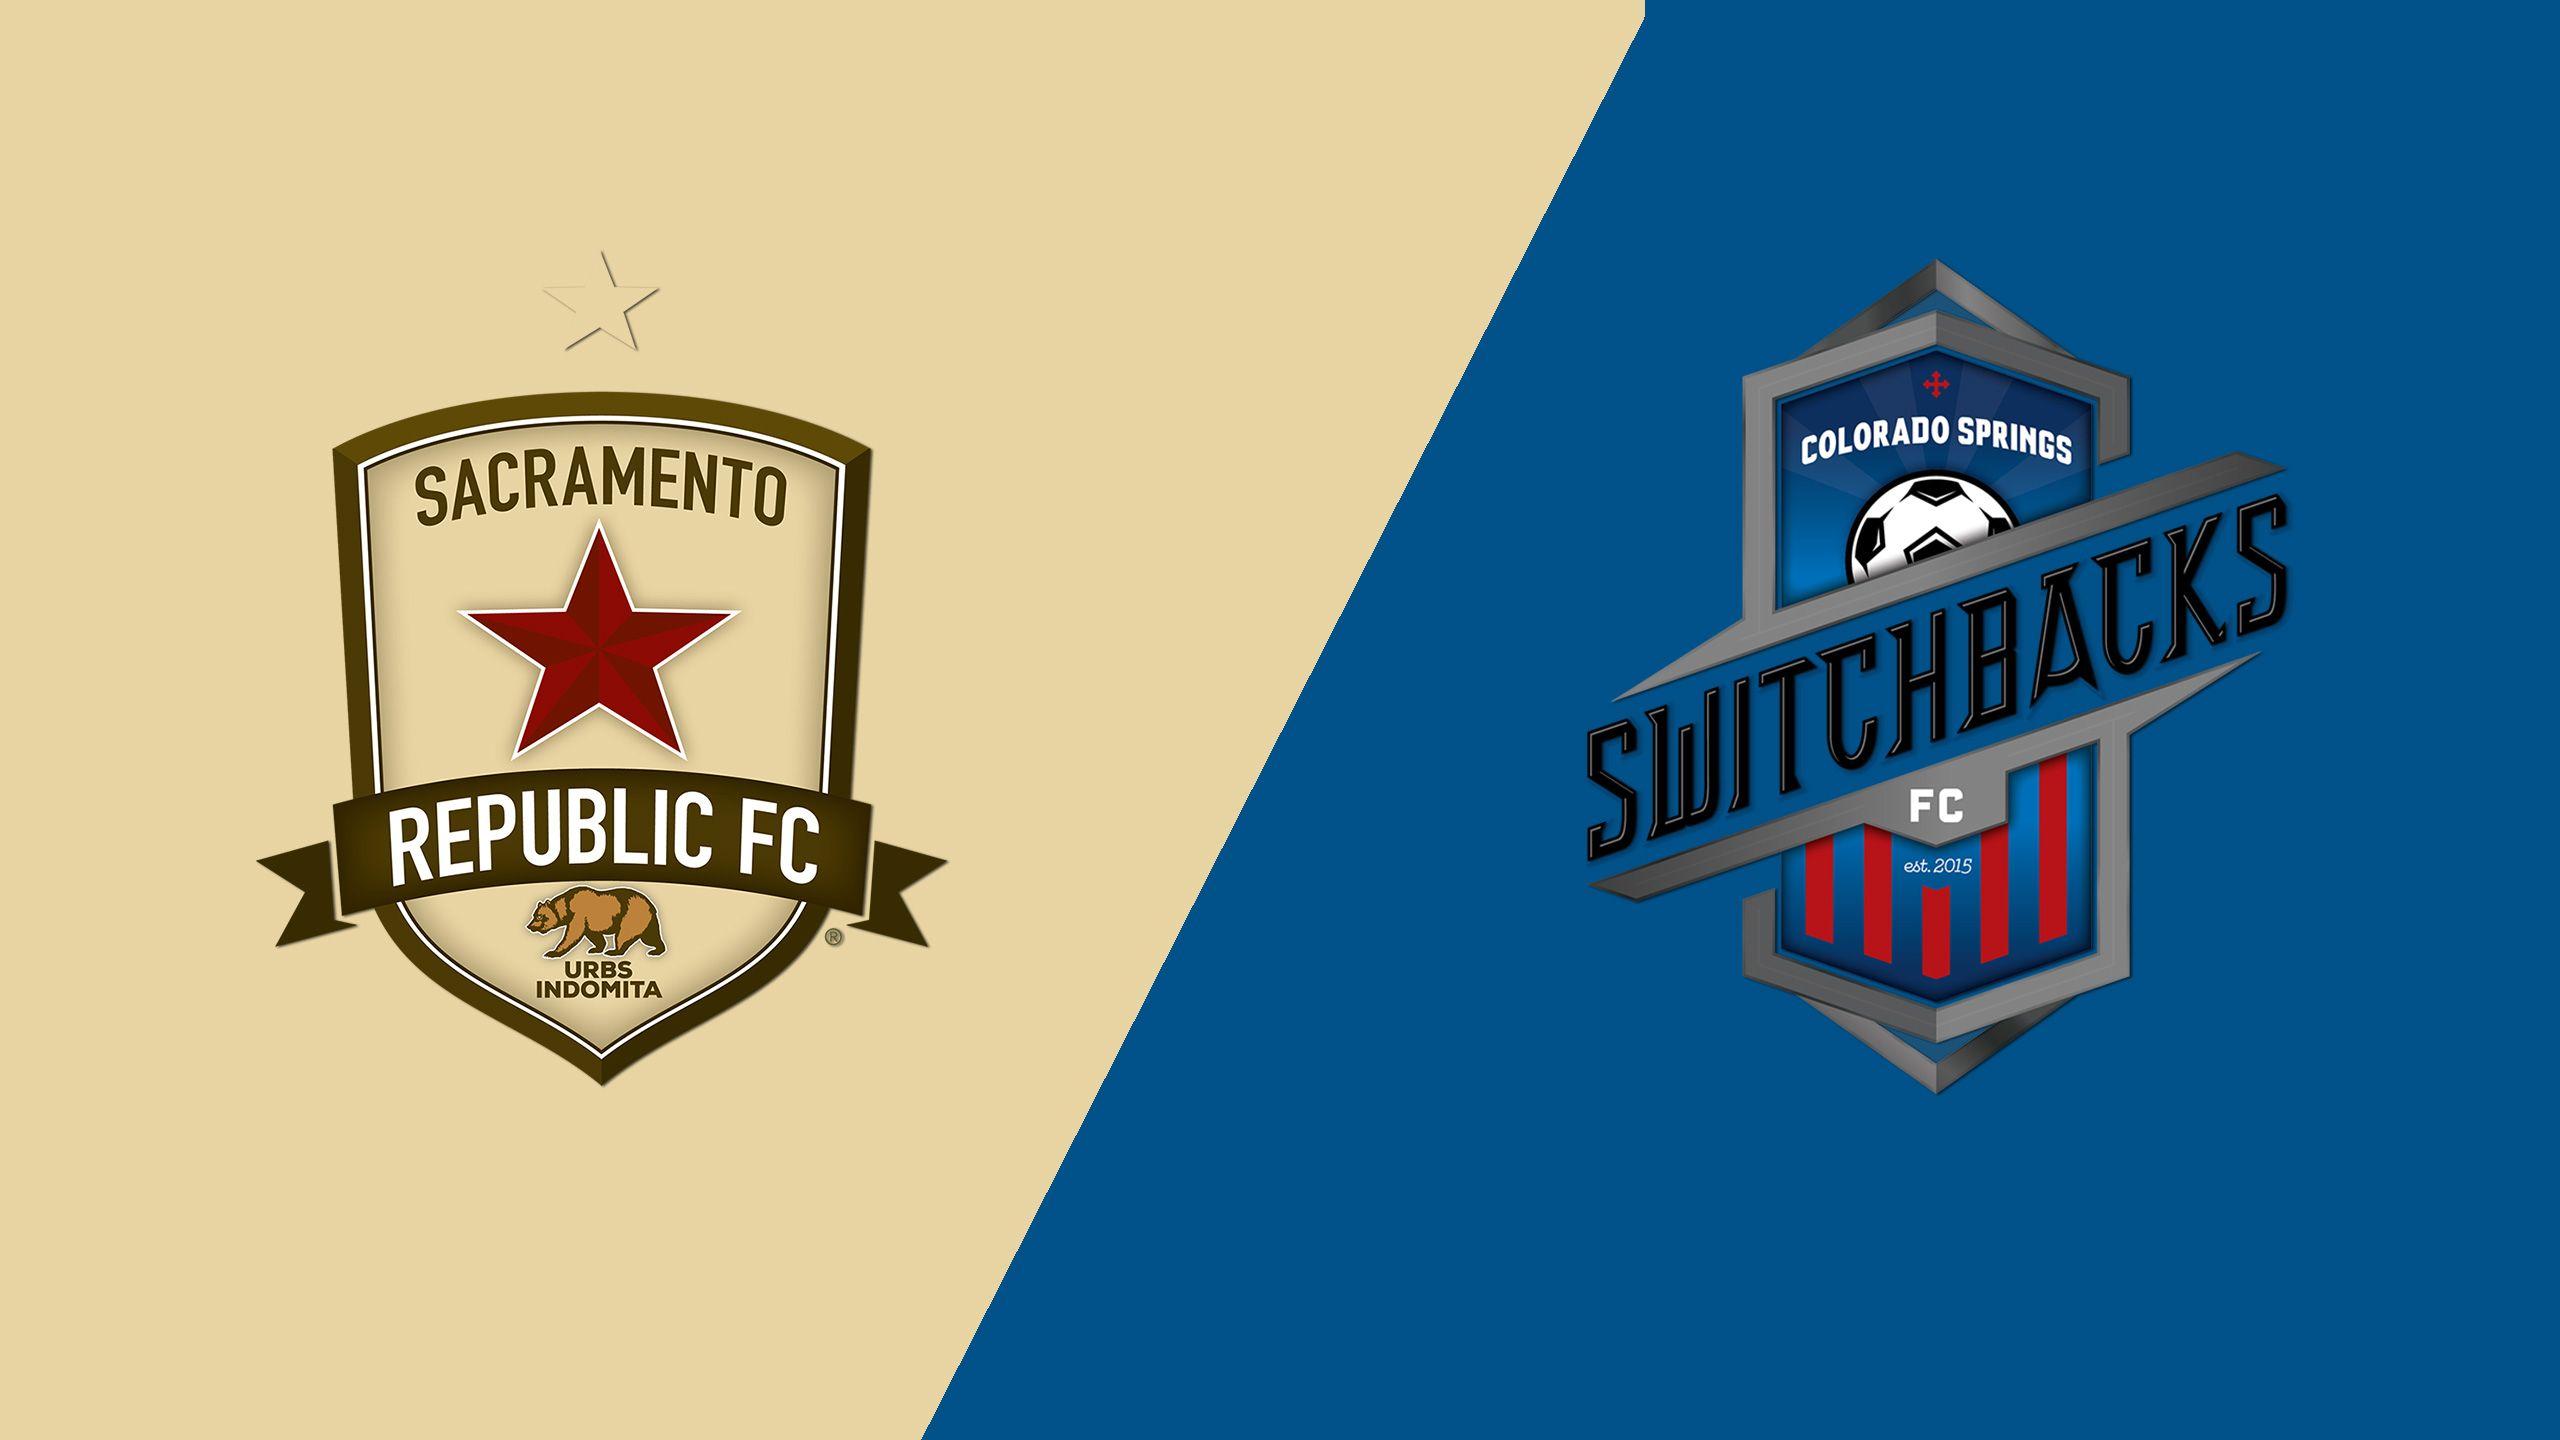 Sacramento Republic FC vs. Colorado Springs Switchbacks FC